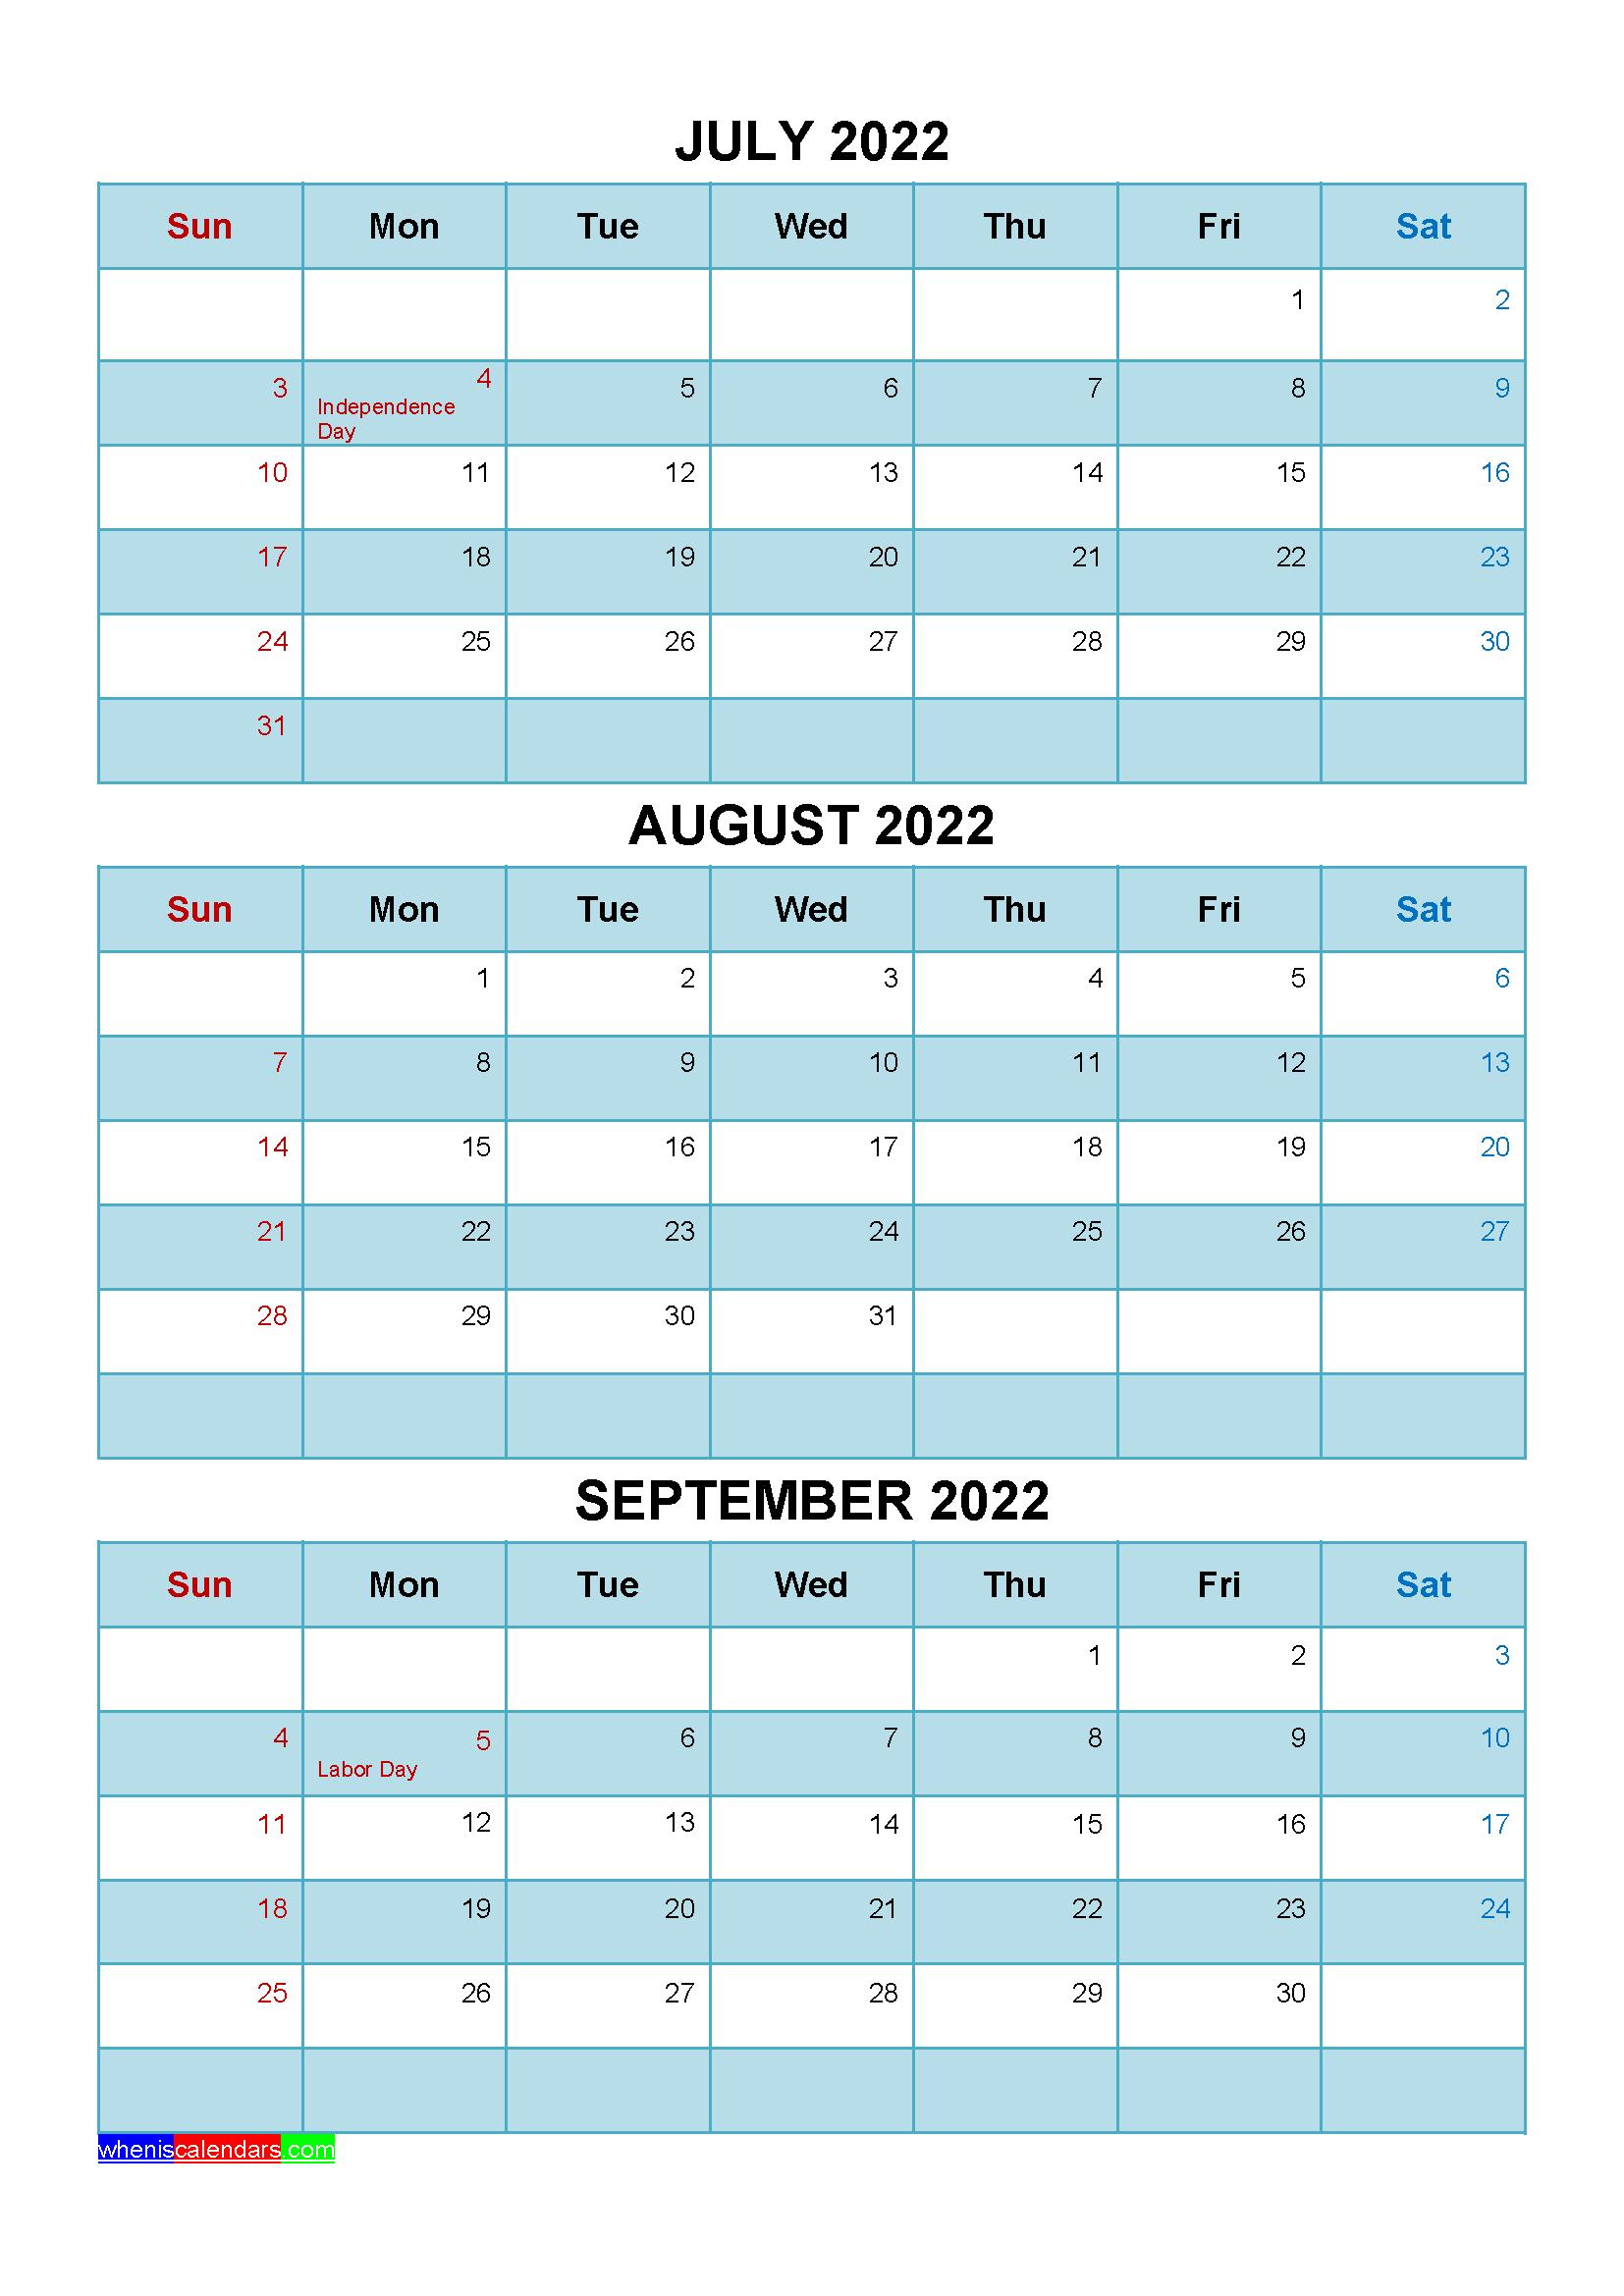 September 2022 Calendar Wallpaper.Free July August September 2022 Calendar With Holidays Four Quarters Calendar Printables Quarterly Calendar Calendar Template